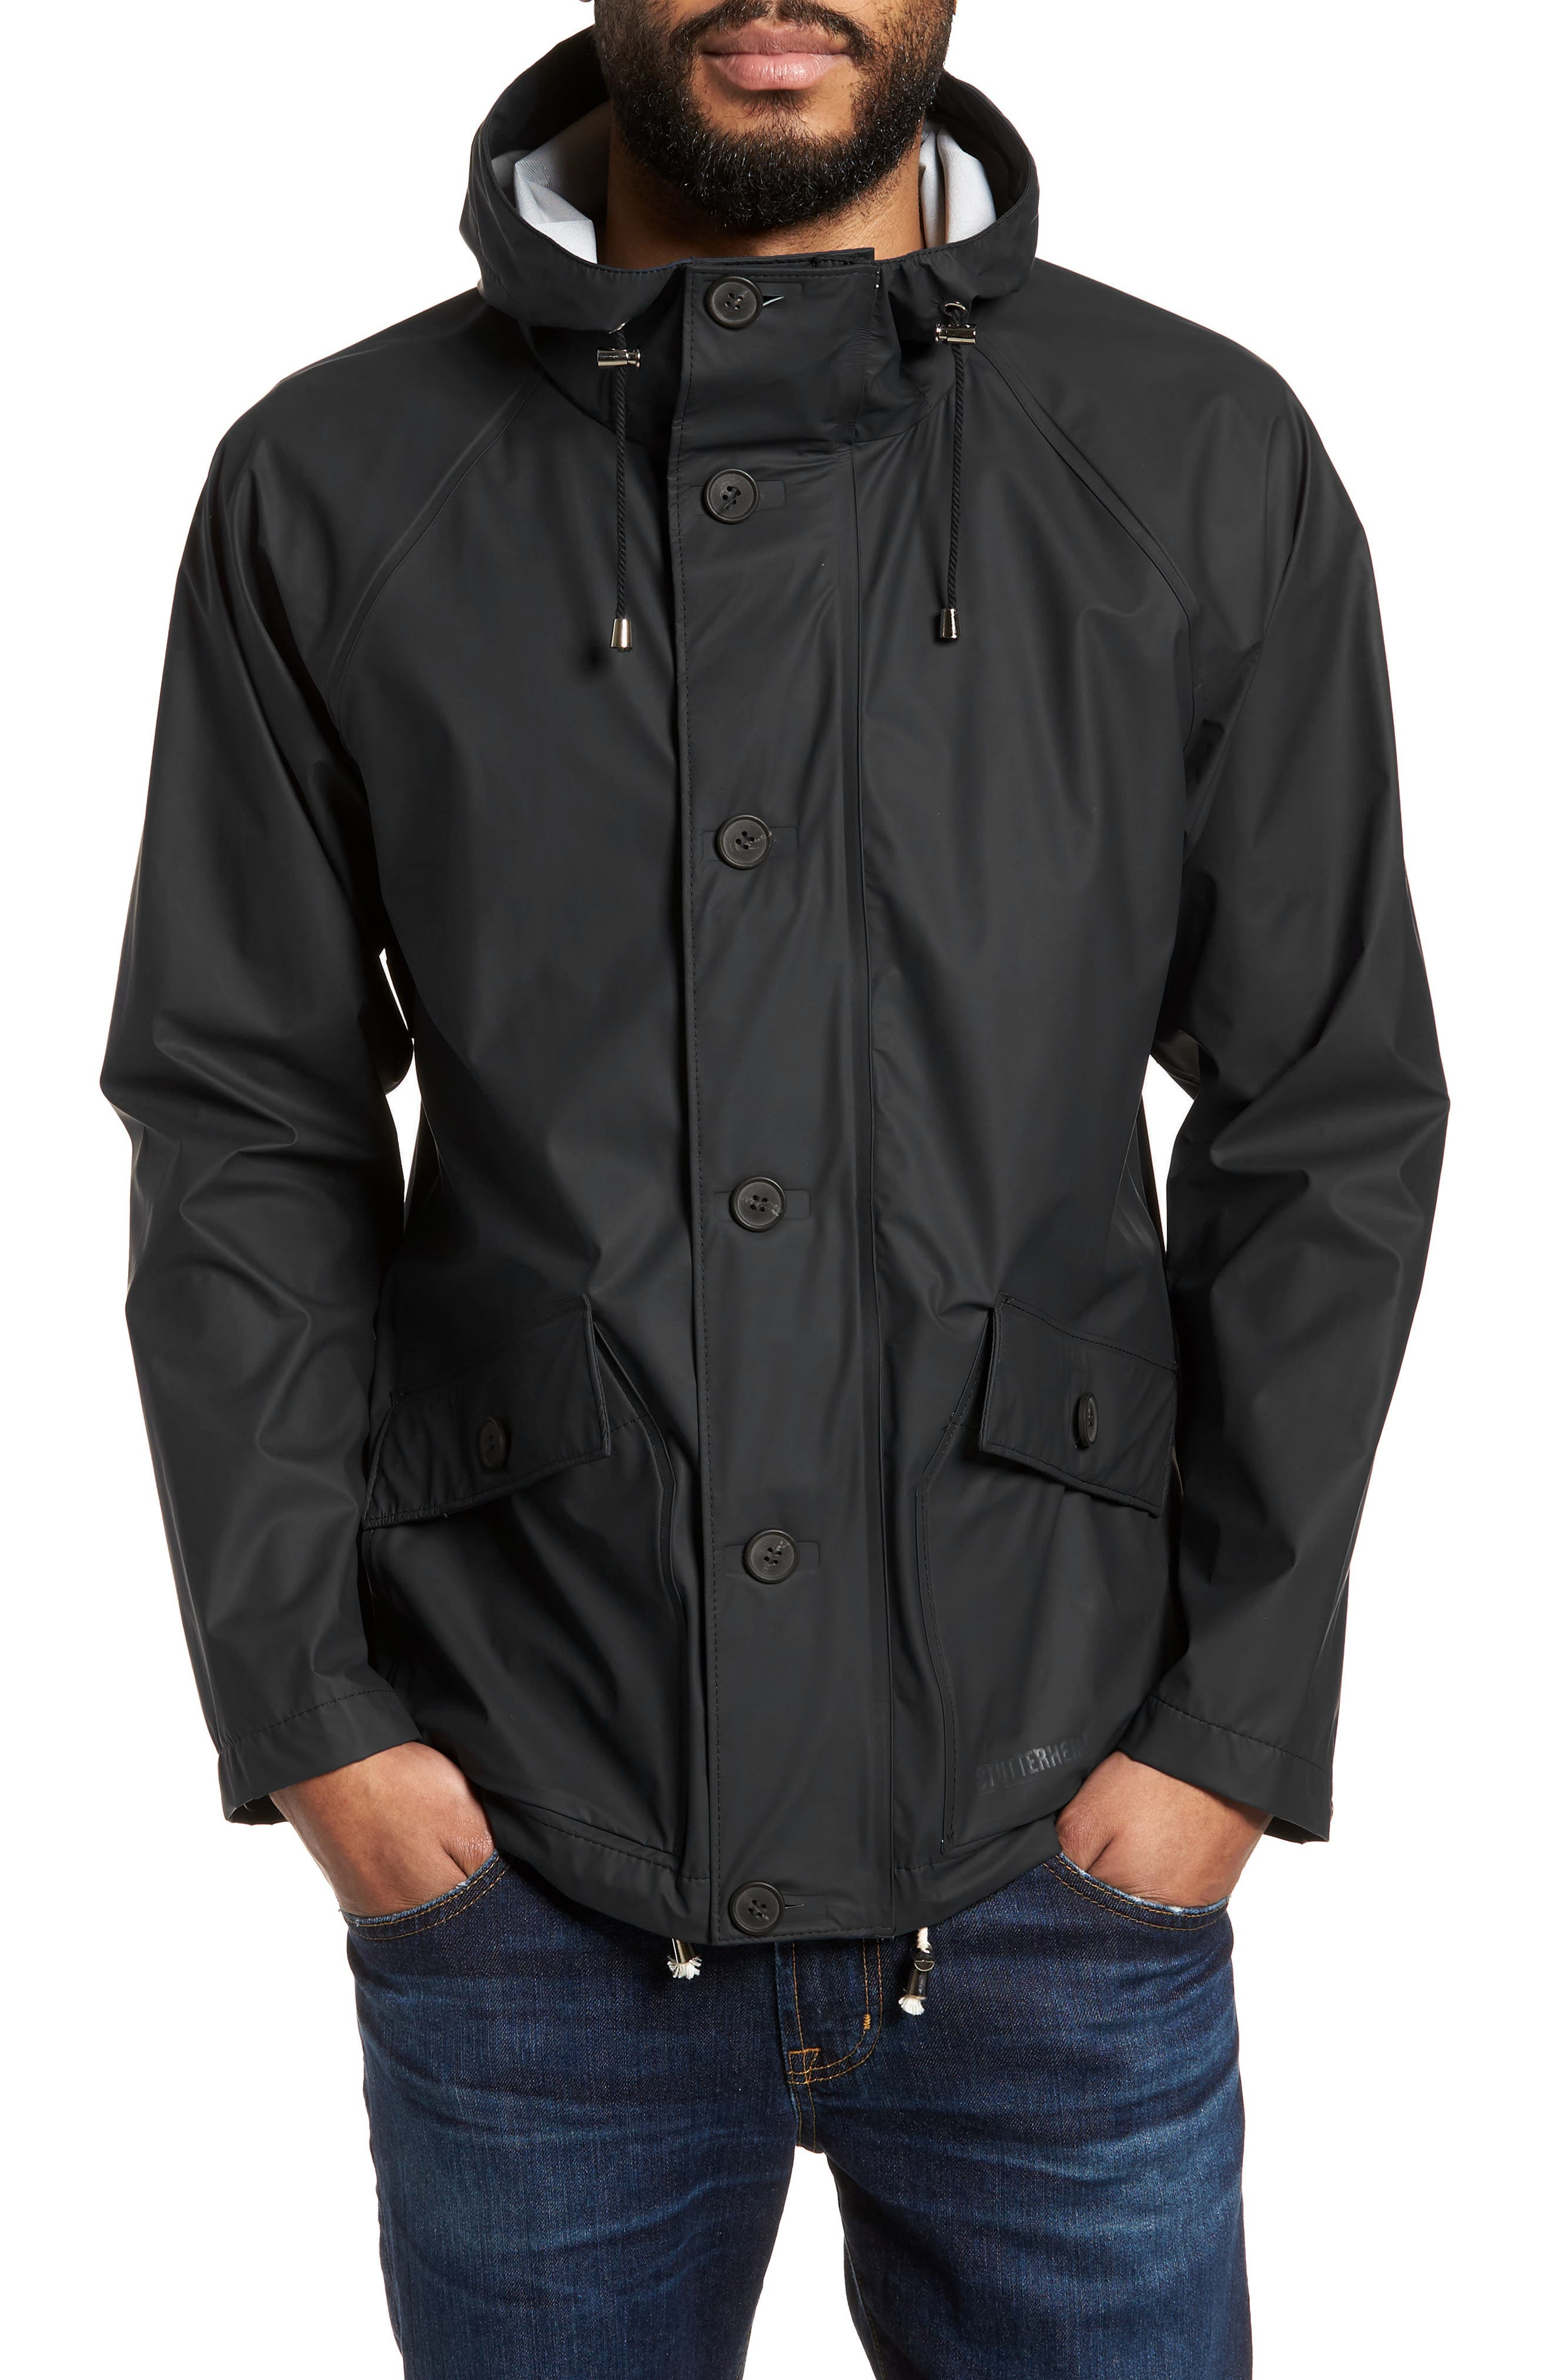 Stenhamra Classic Fit Jacket,                             Main thumbnail 1, color,                             Black